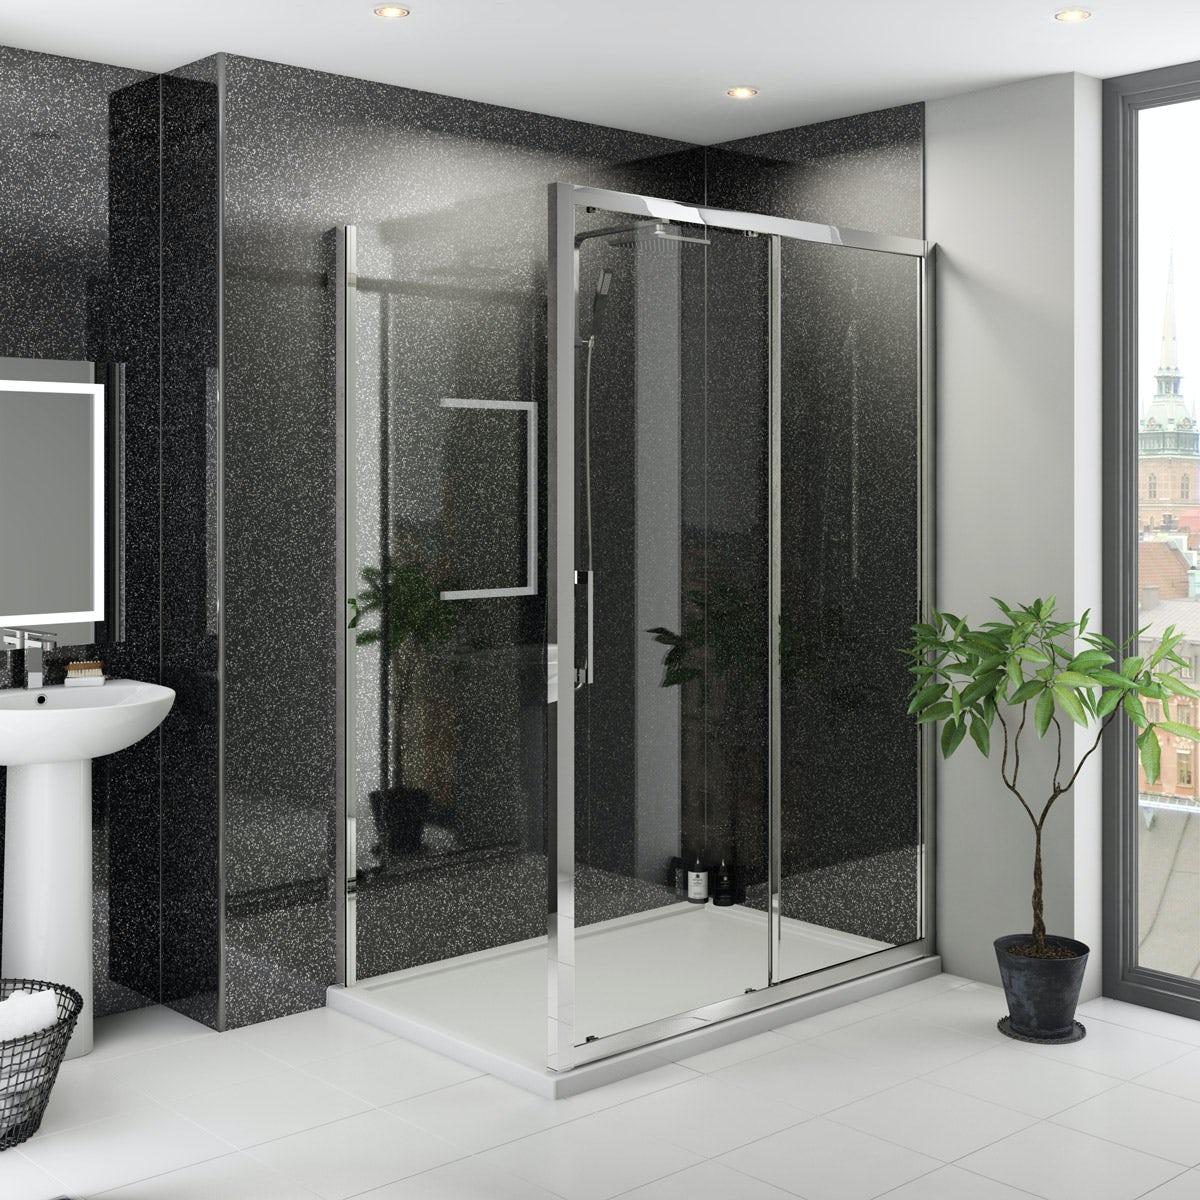 Multipanel Classic Premier Twilight Hydrolock shower wall panel